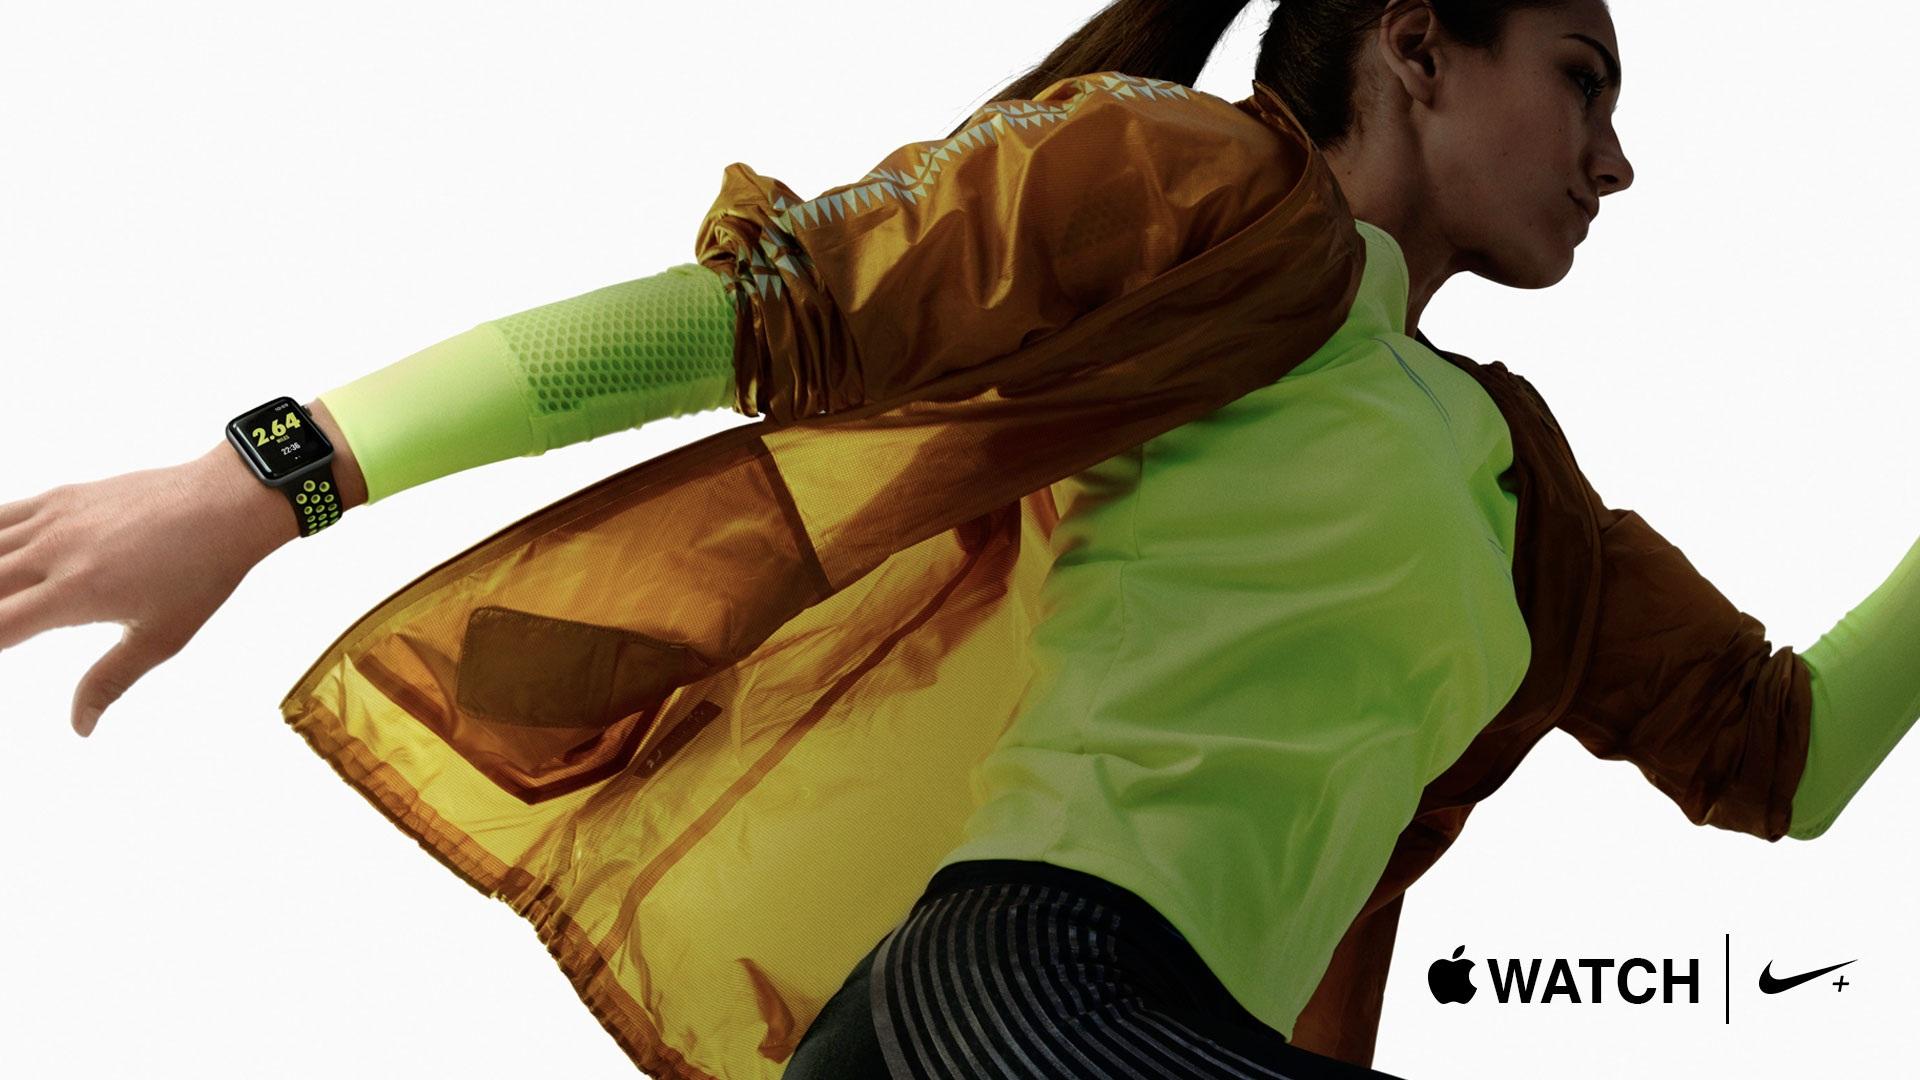 applewatch.jpg